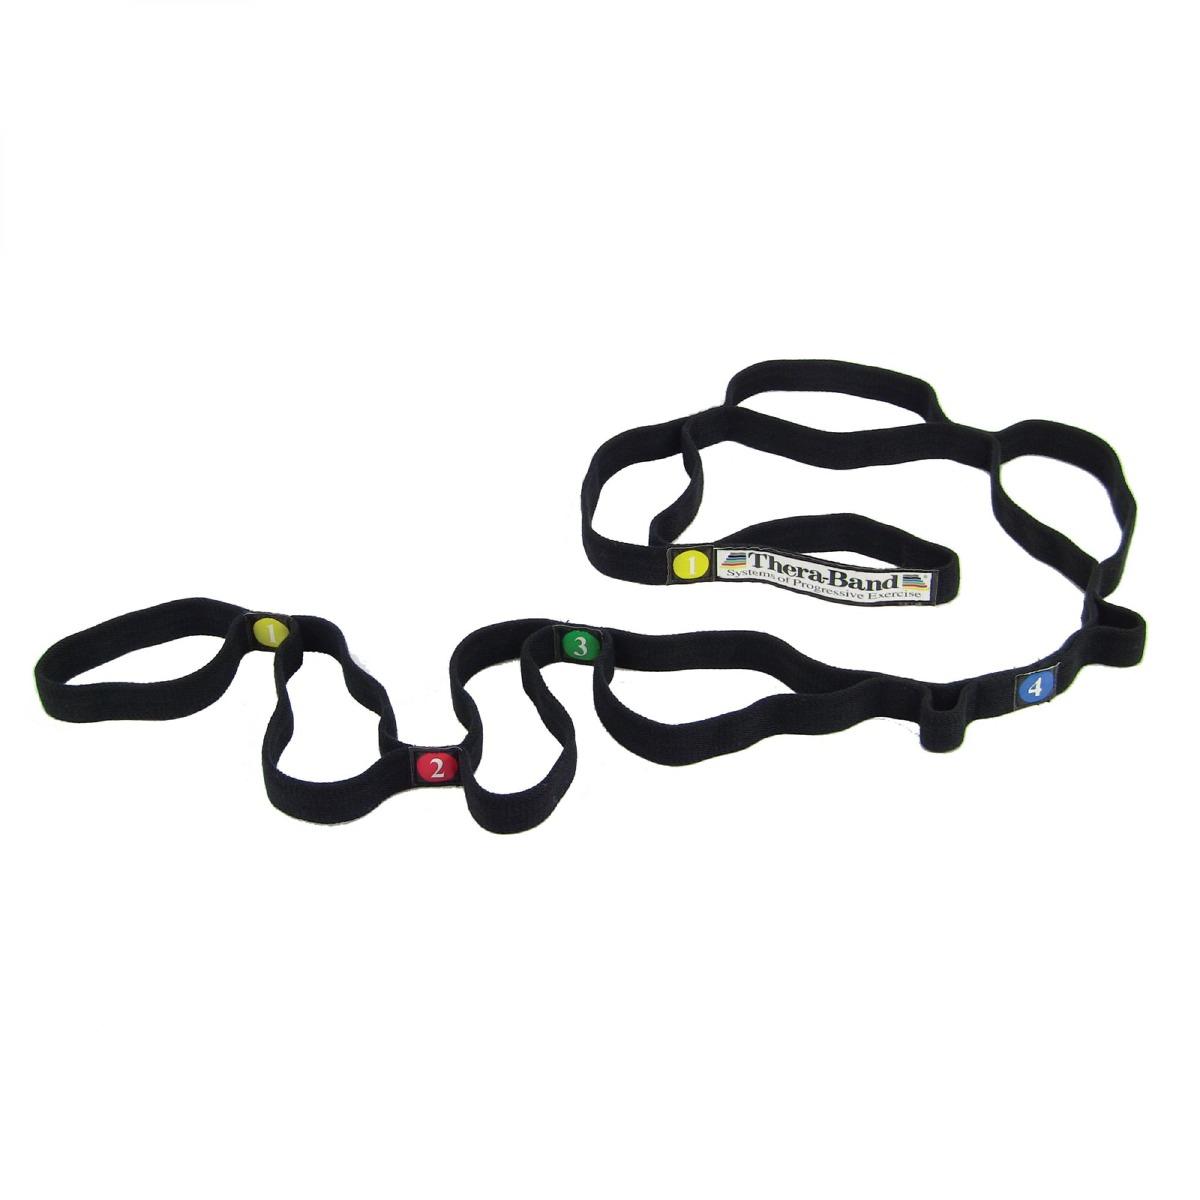 Black TheraBand stretch strap